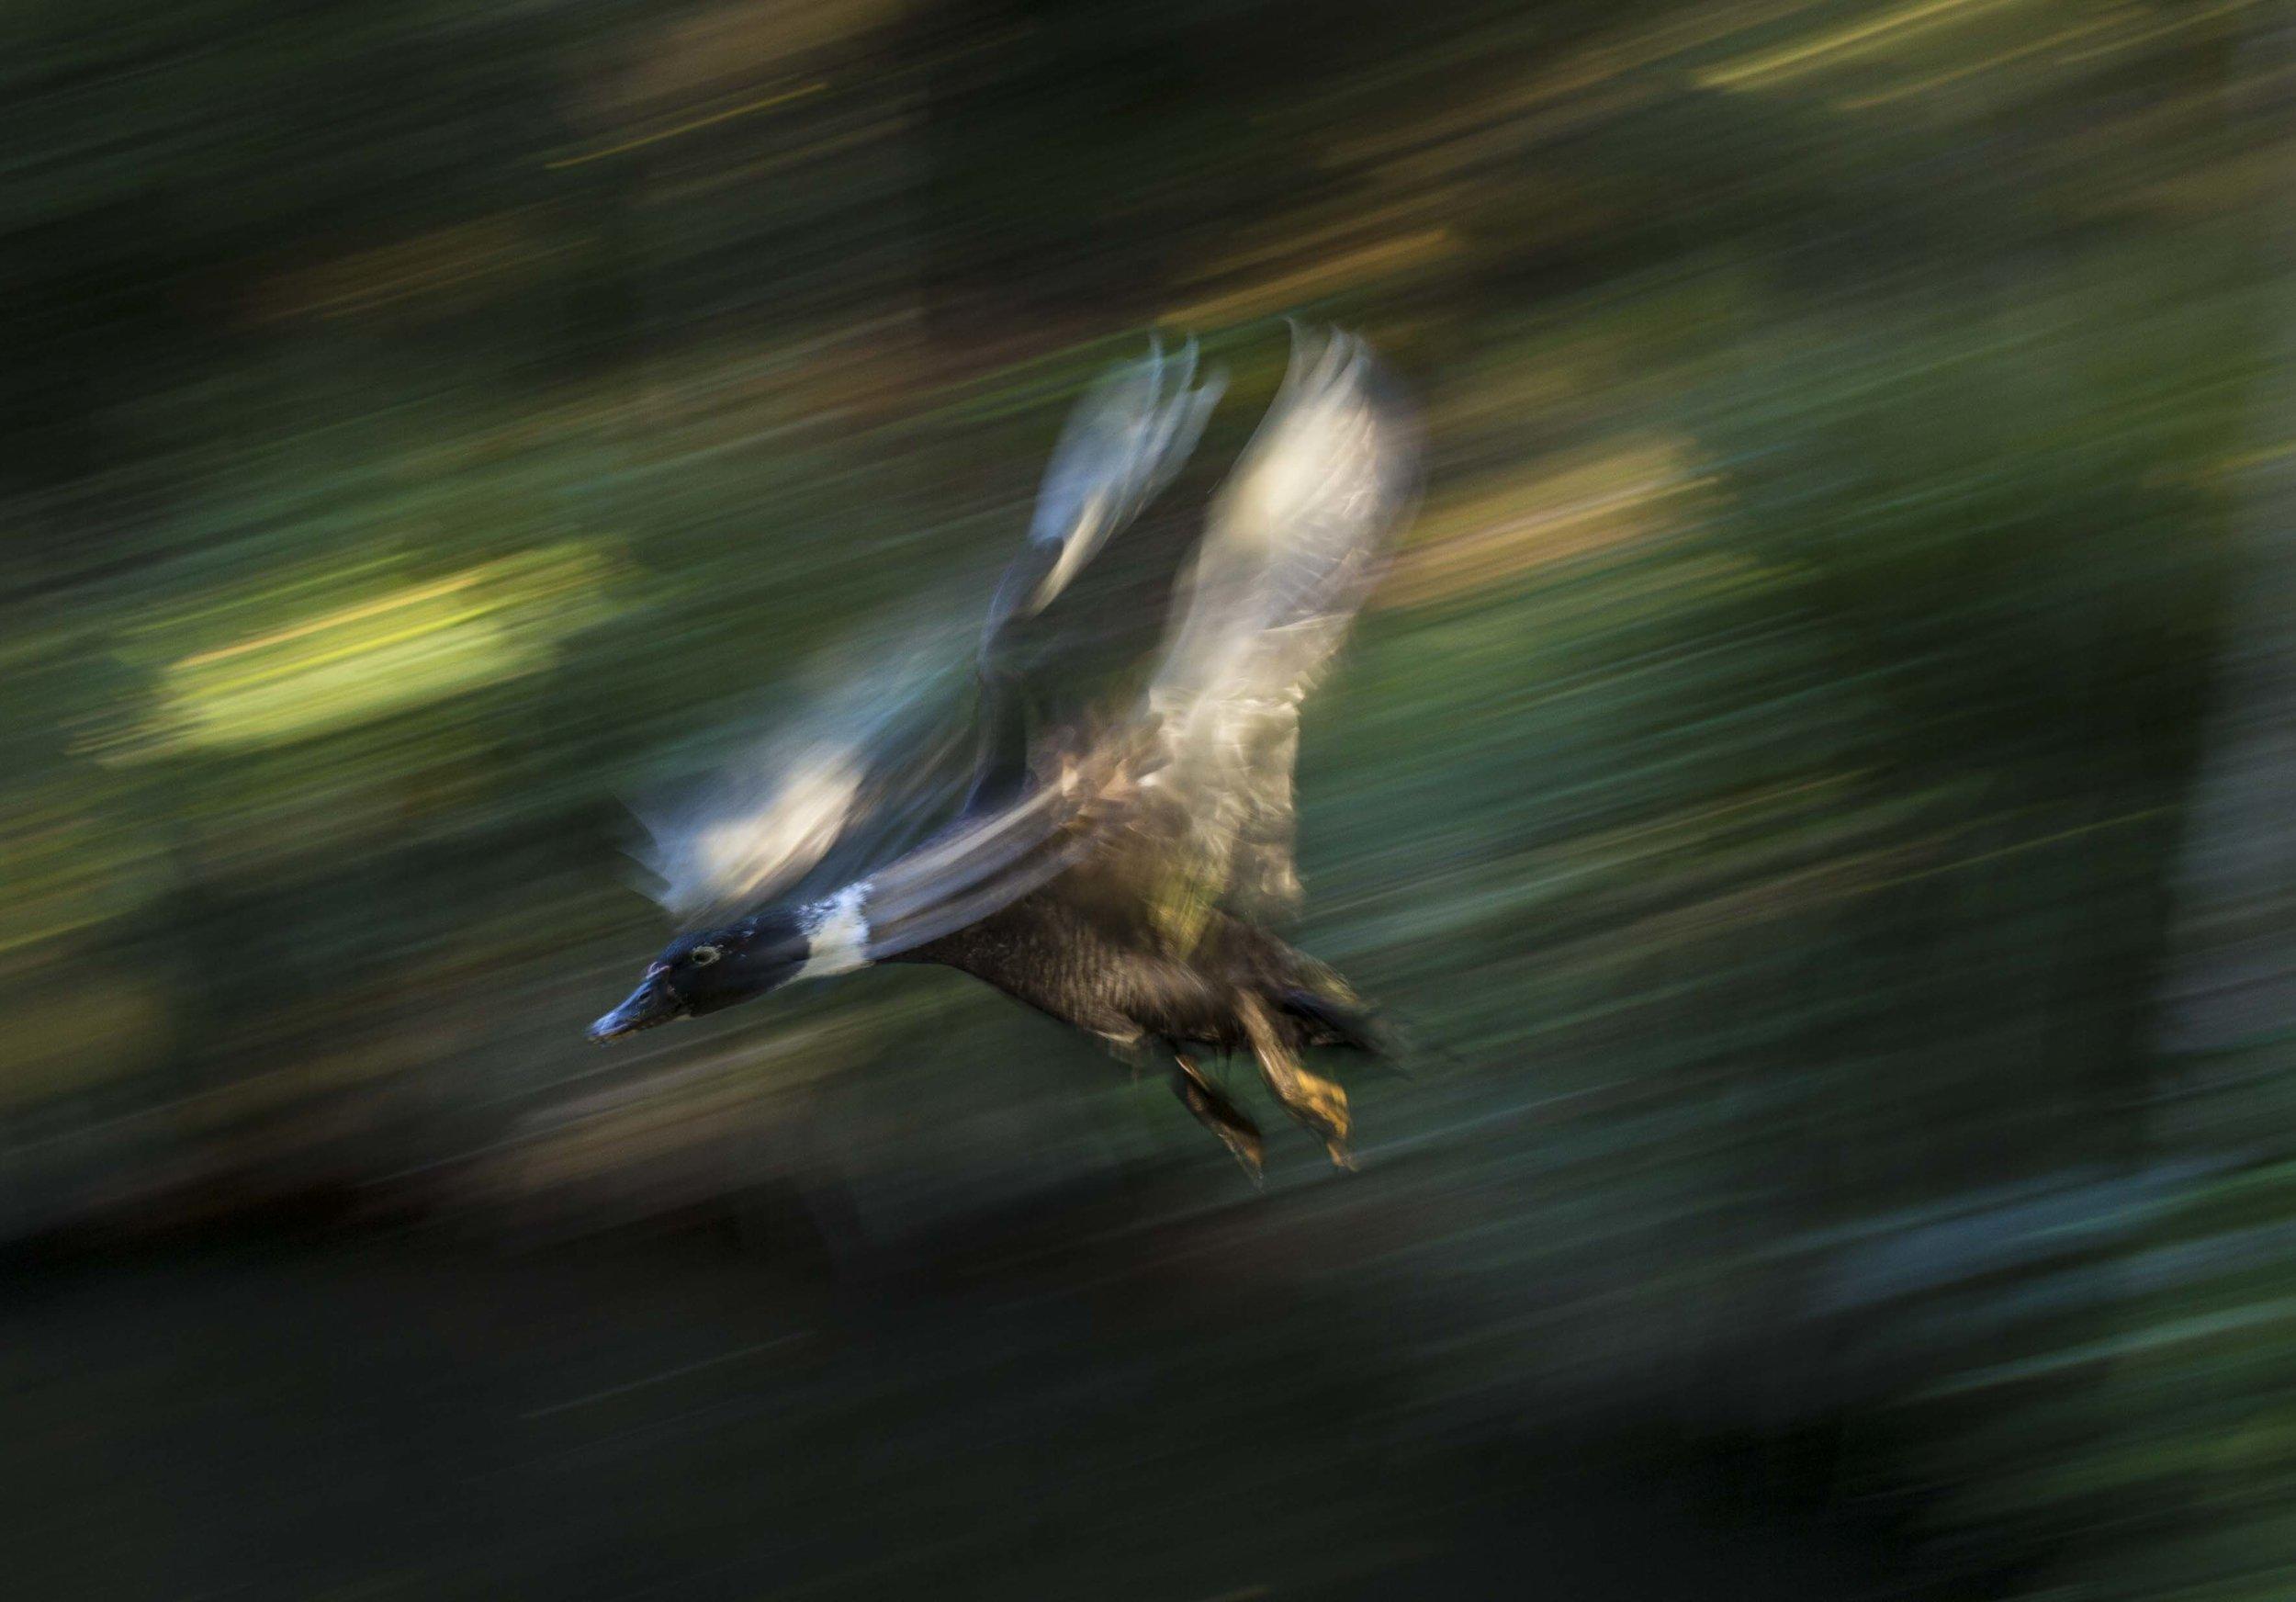 """Sparkle the duck, in full flight""                            ©Russell Shakespeare 2017"